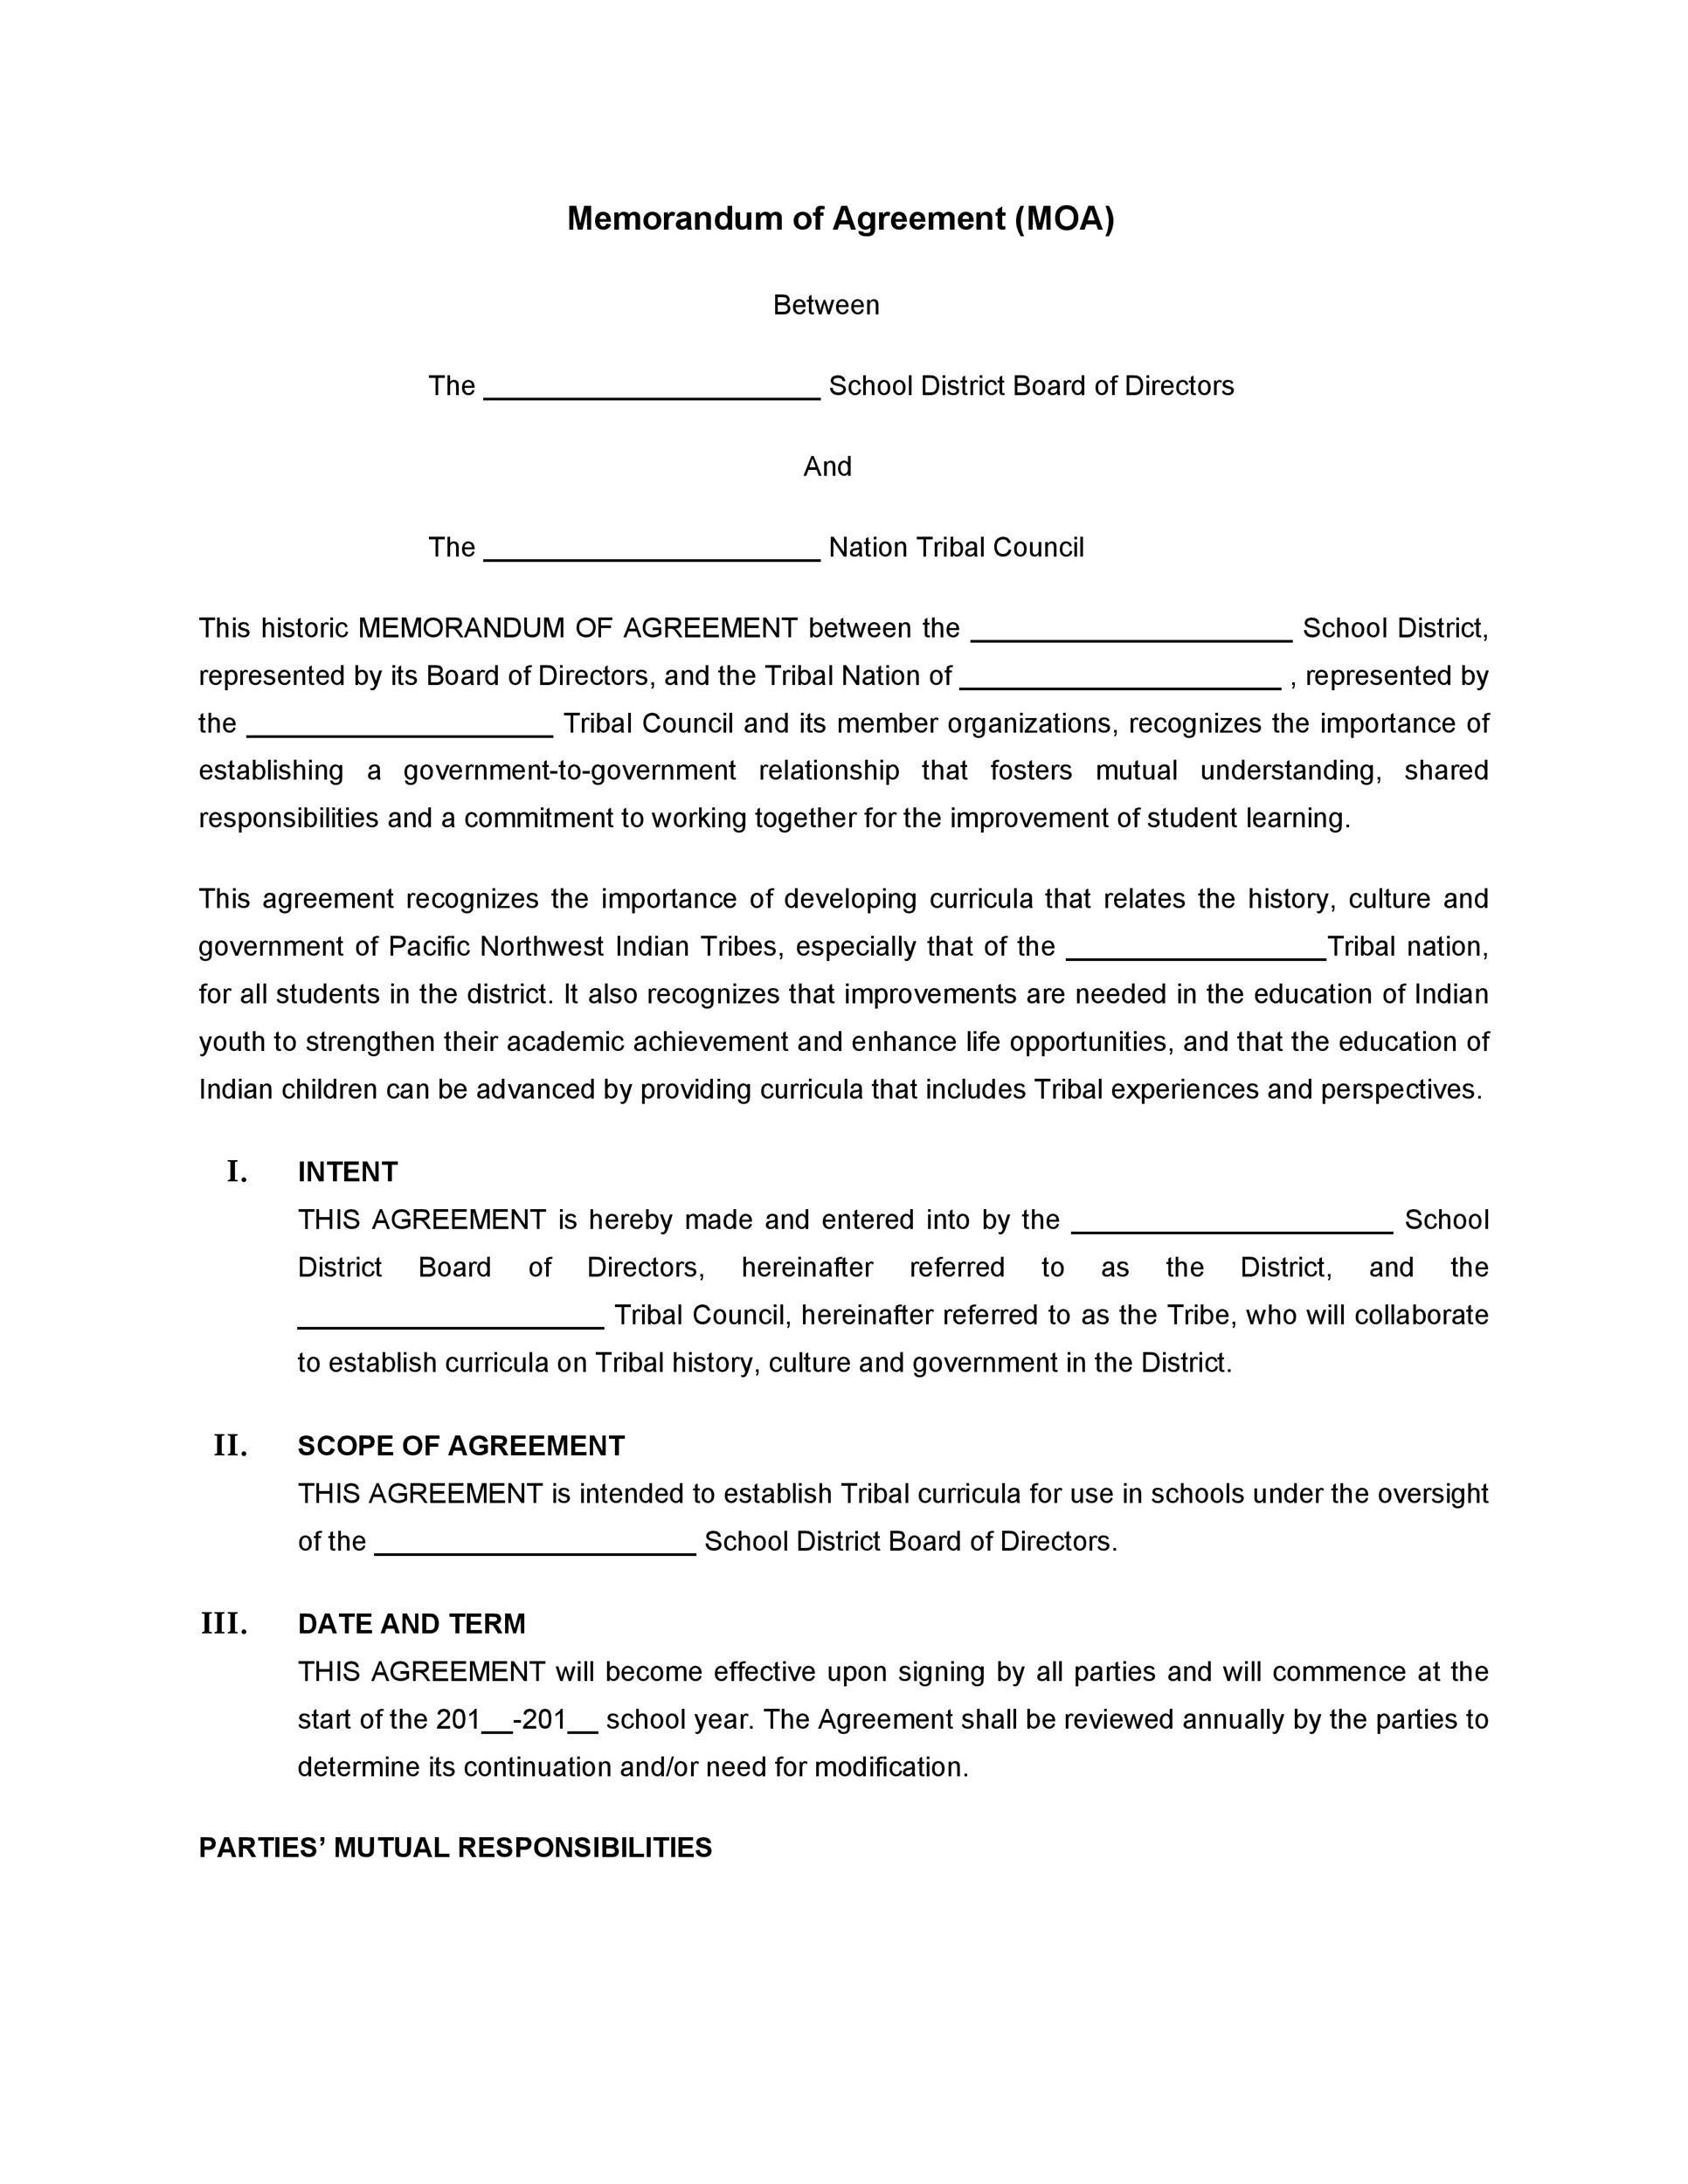 Free private placement memorandum template 03